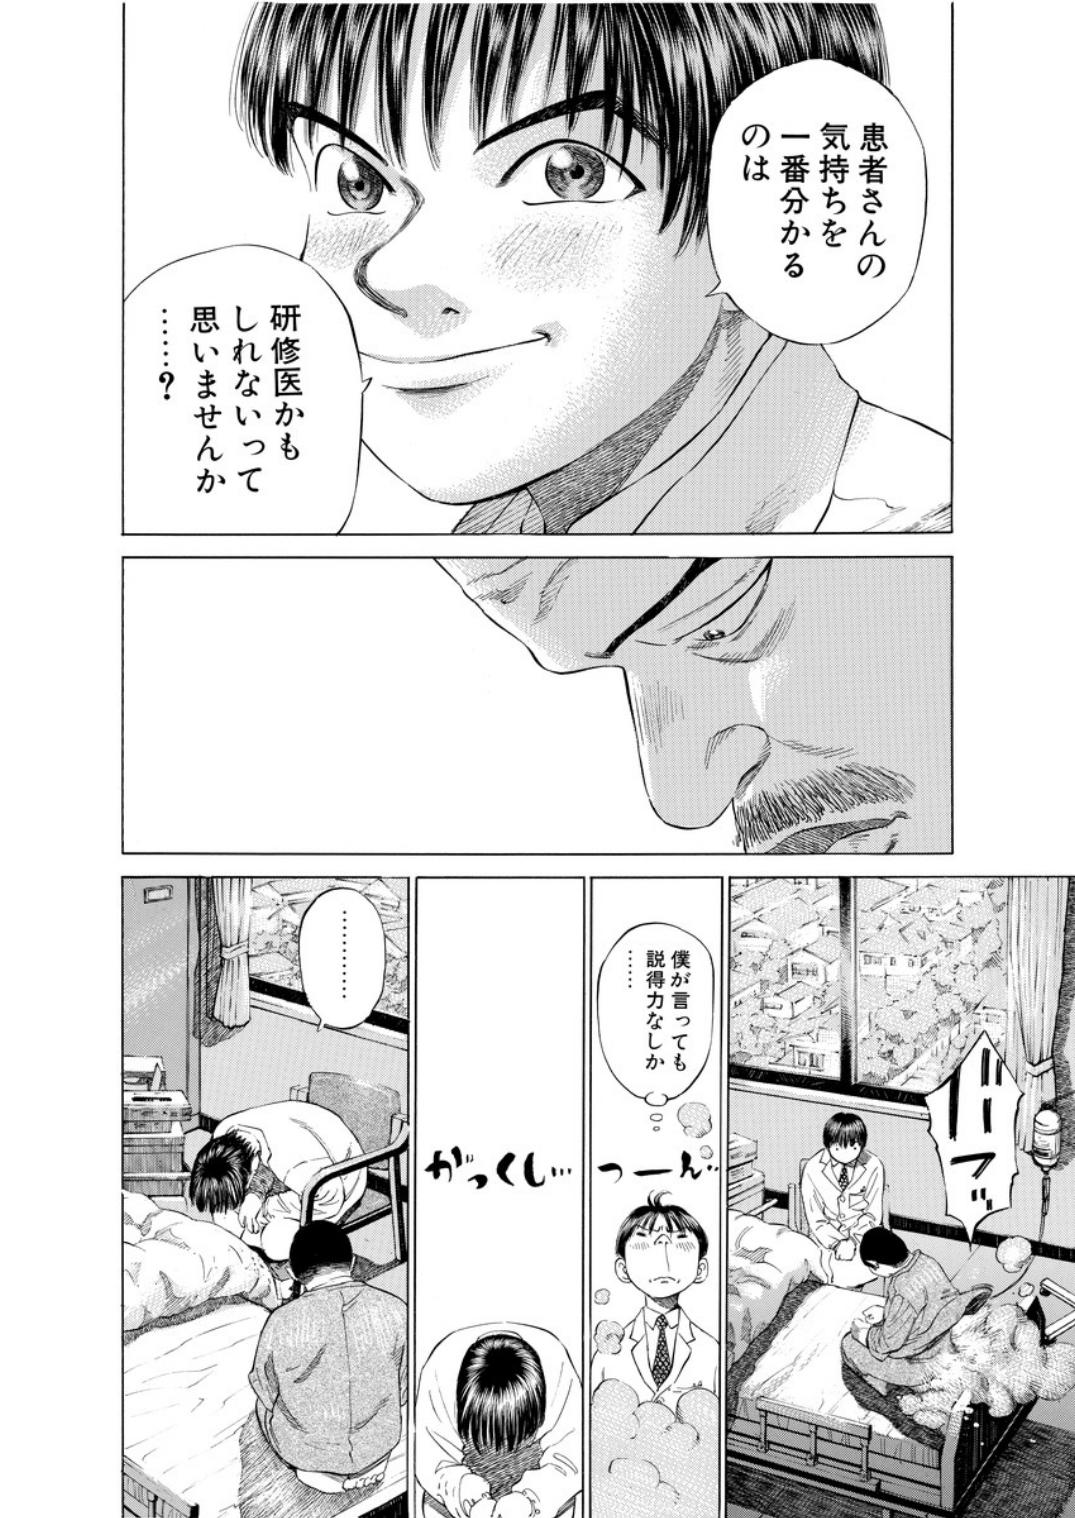 001bj_page-0180.jpg